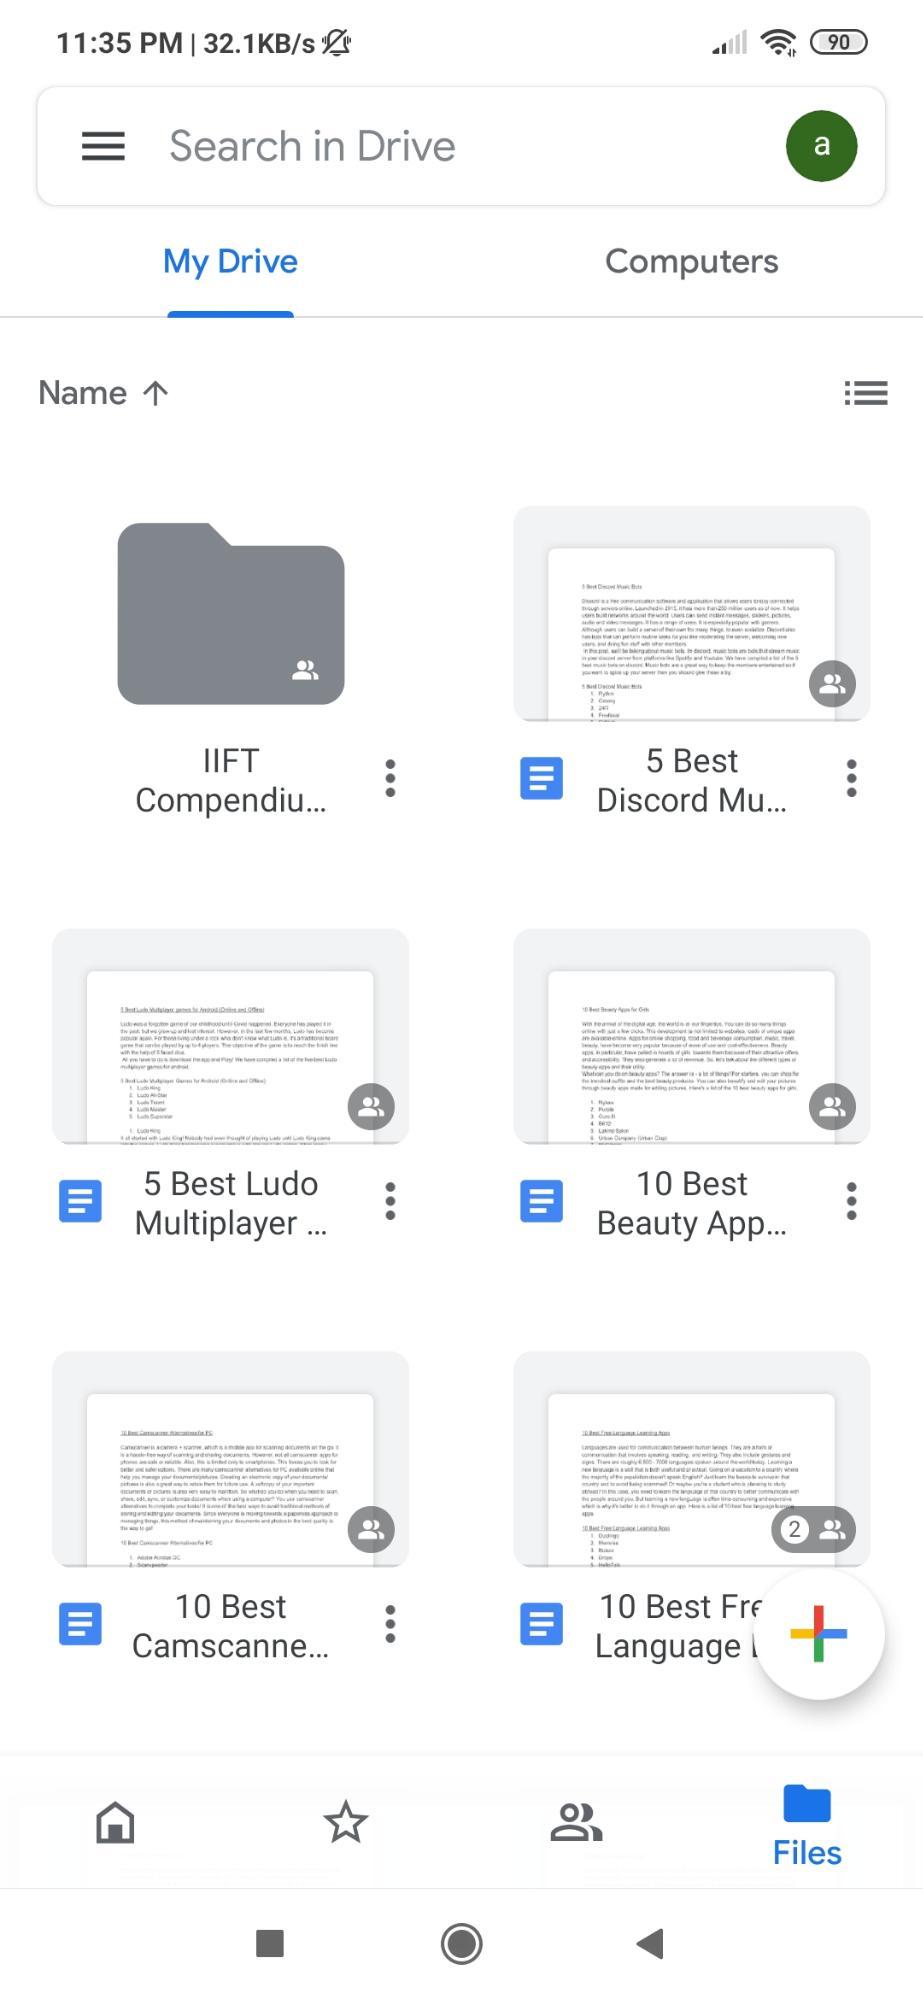 OPen Google Drive App on Mobile